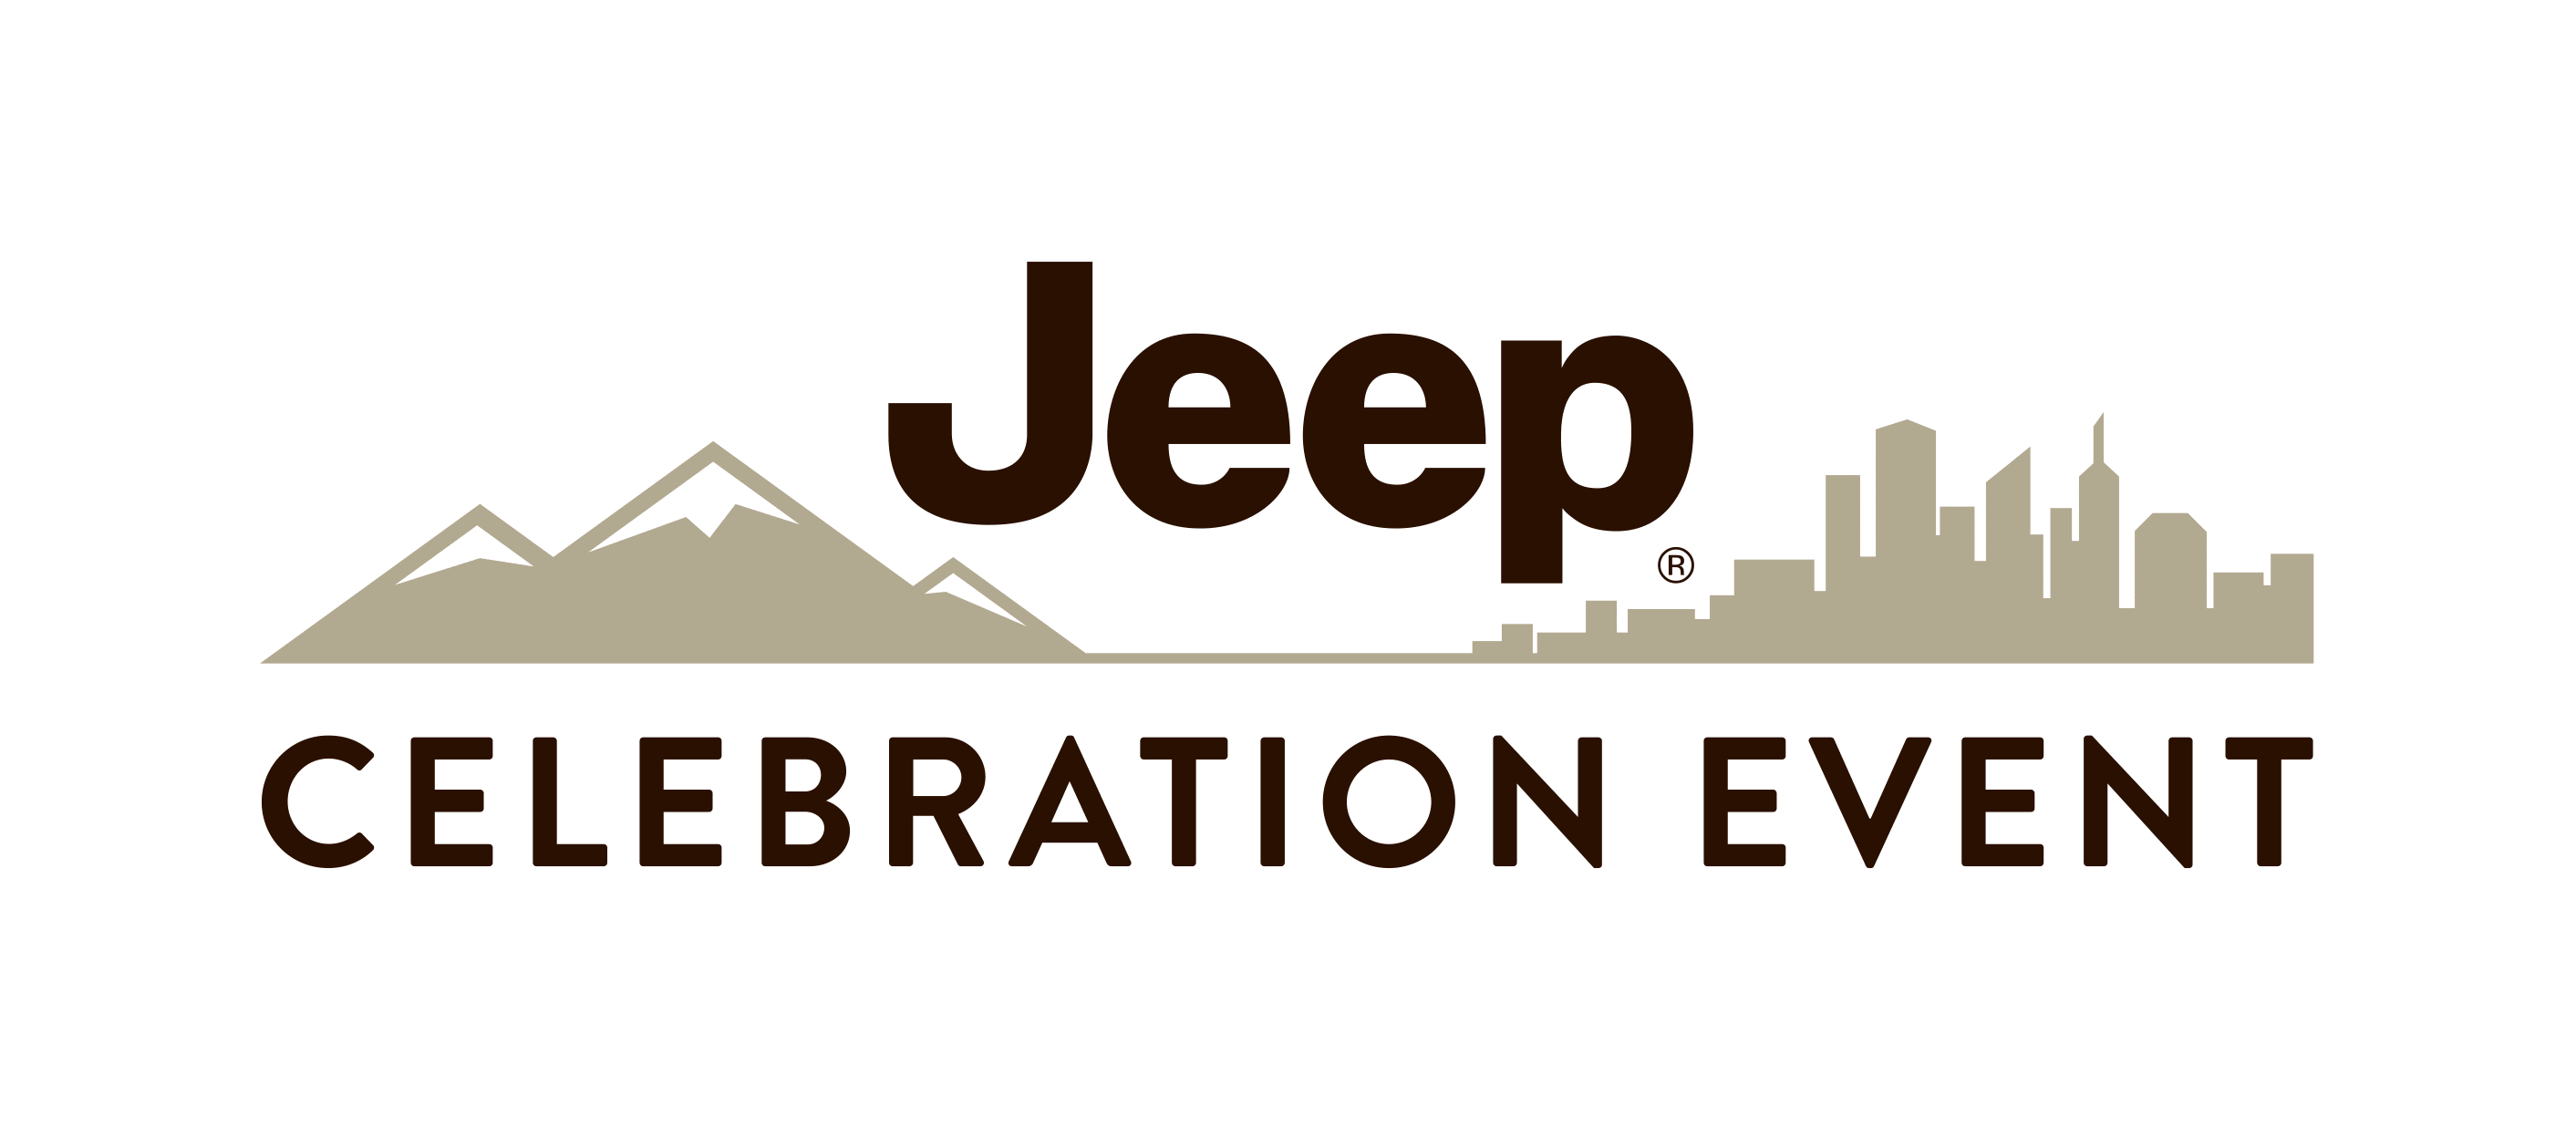 Jeep Celebration